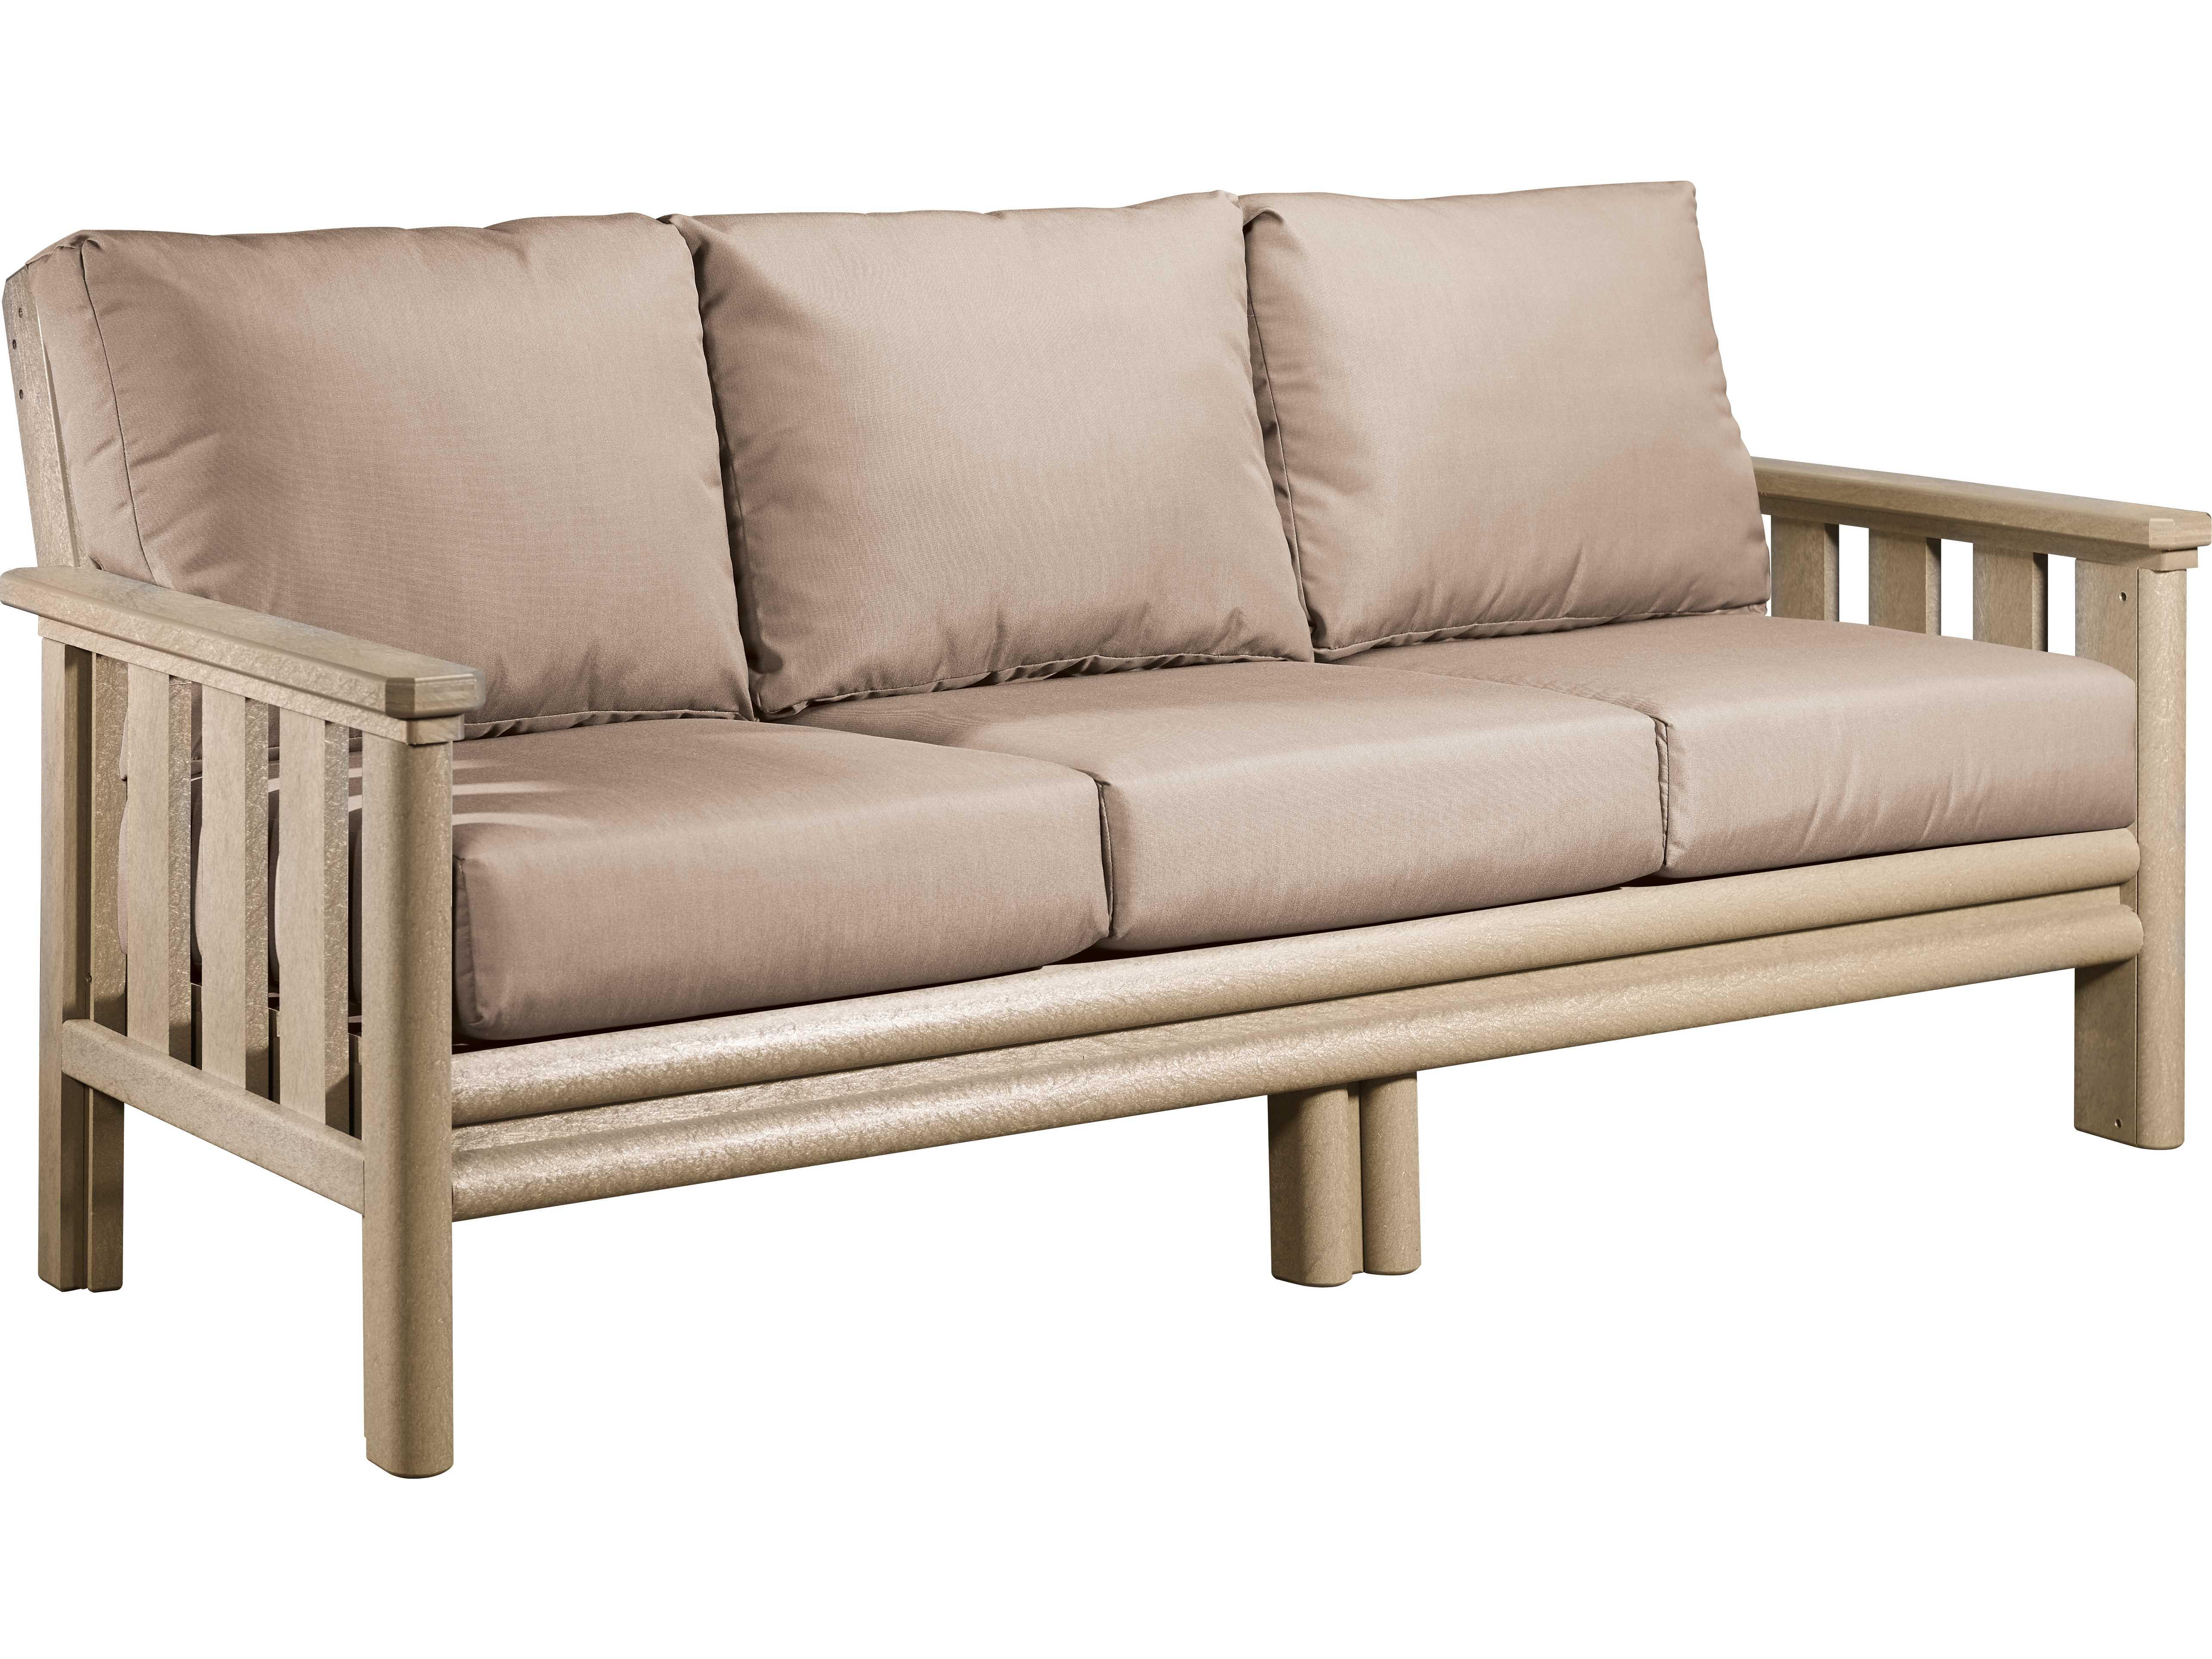 C R Plastic Stratford Recycled Plastic Sofa Ds143